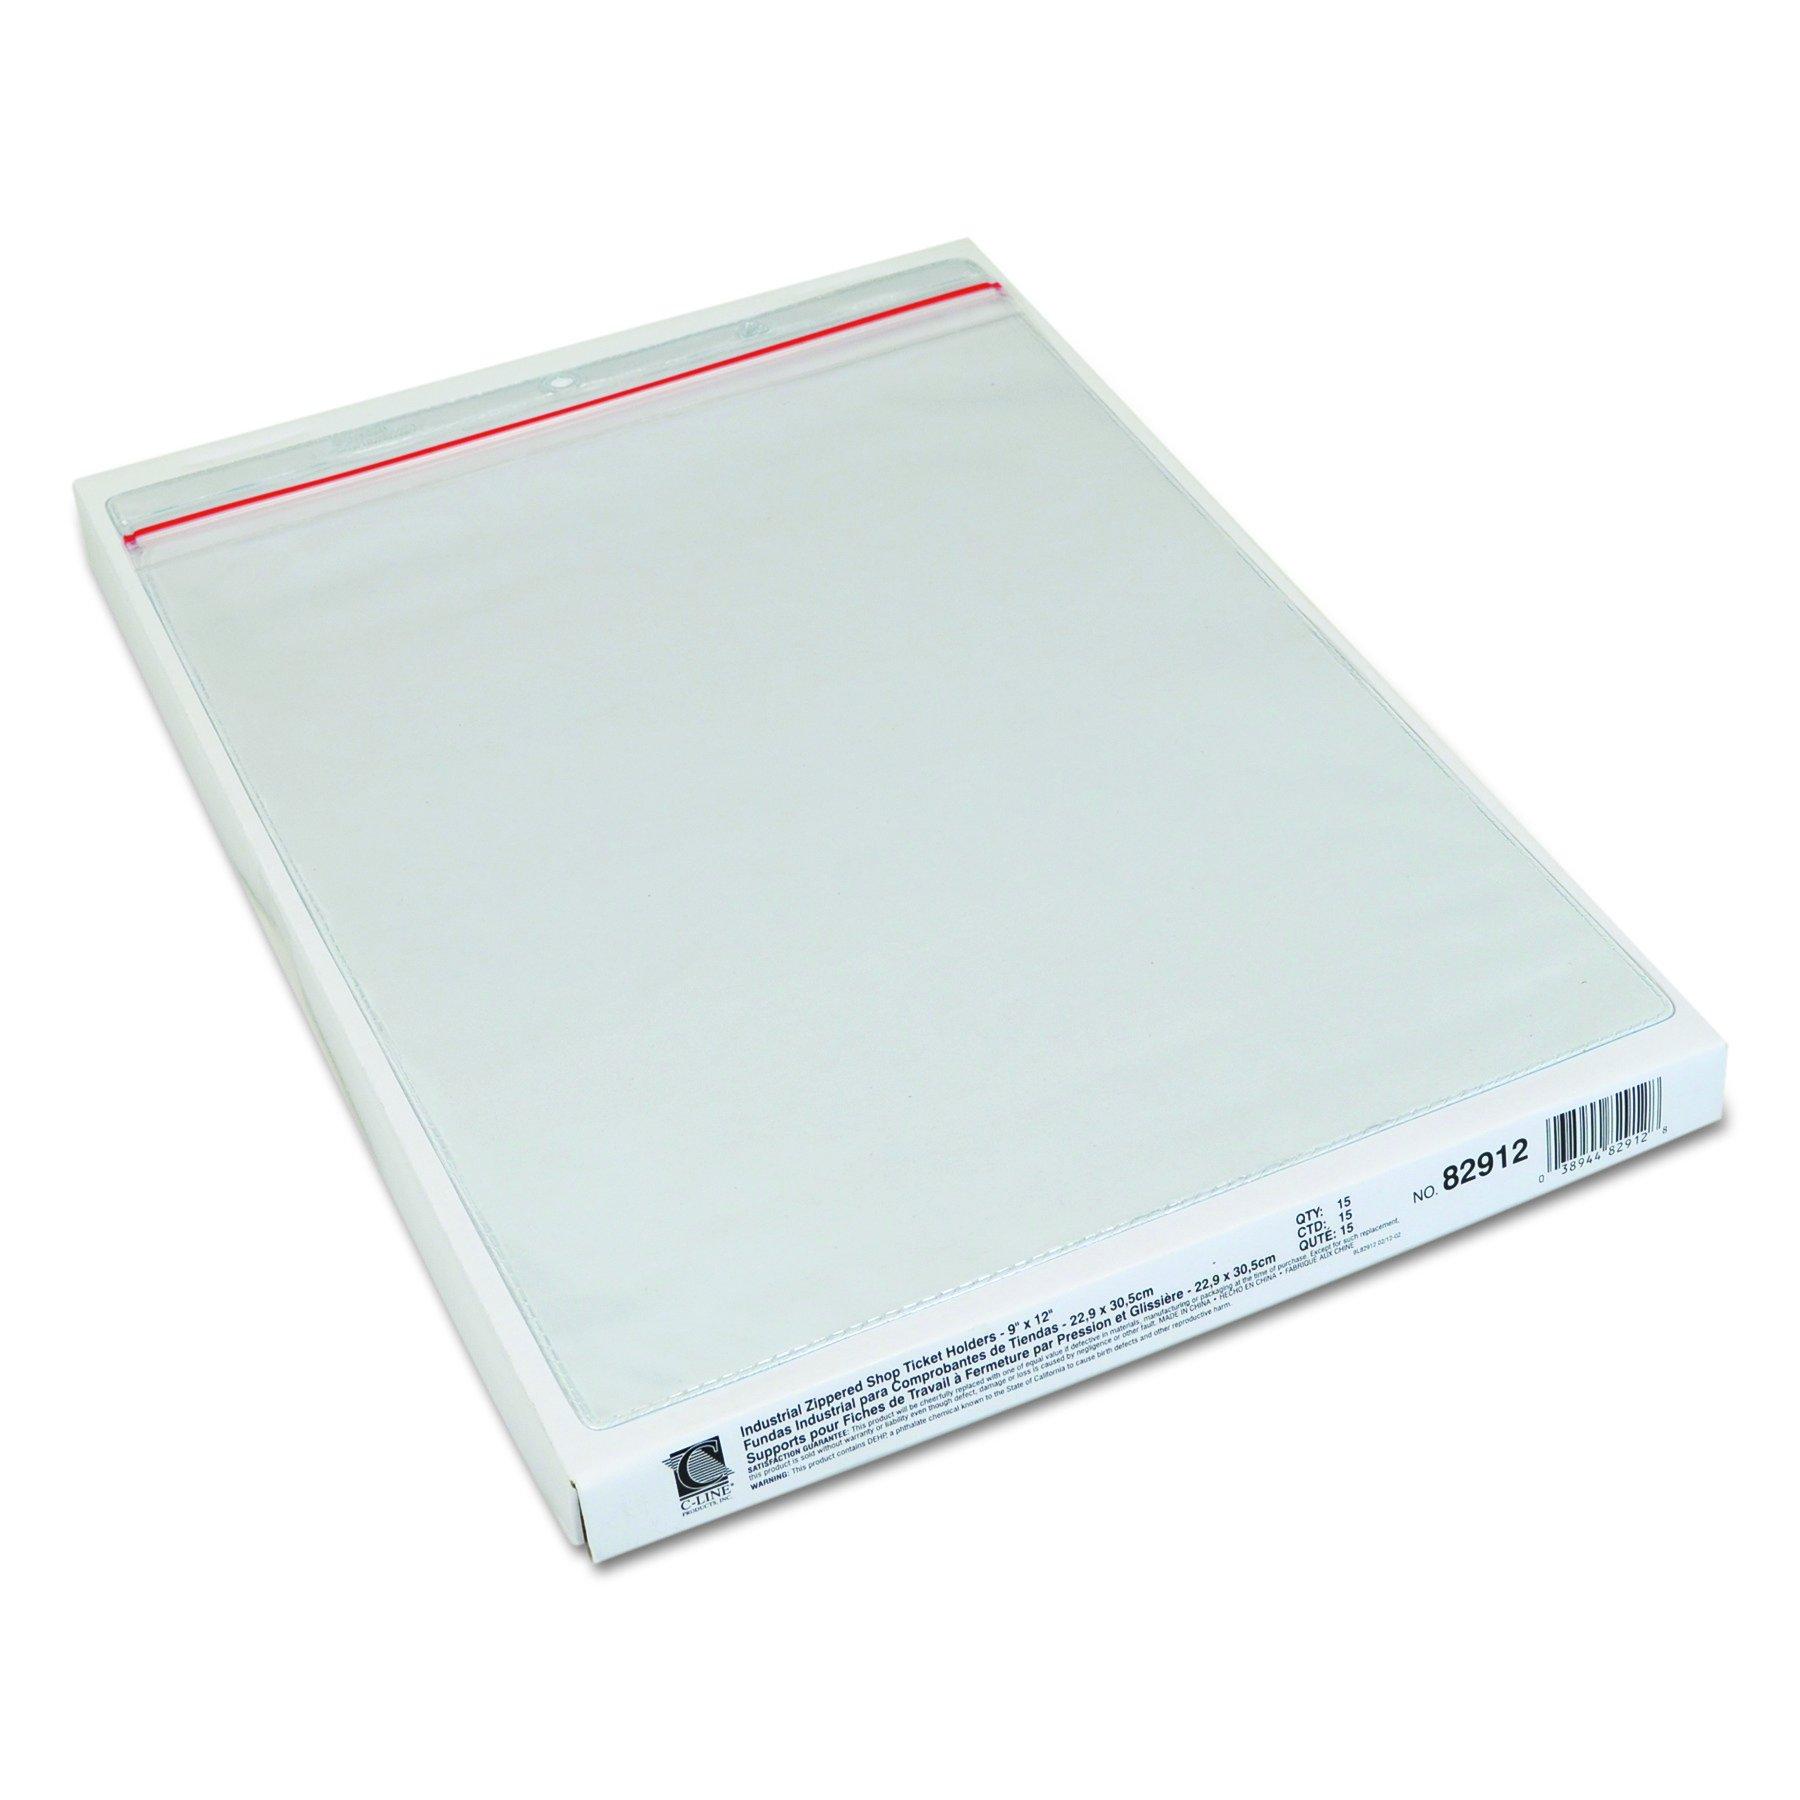 Clear 9 X 12 15//BX Sold as 1 Box 15 Each per Box Industrial Zipper Seal Shop Ticket Holders Vinyl